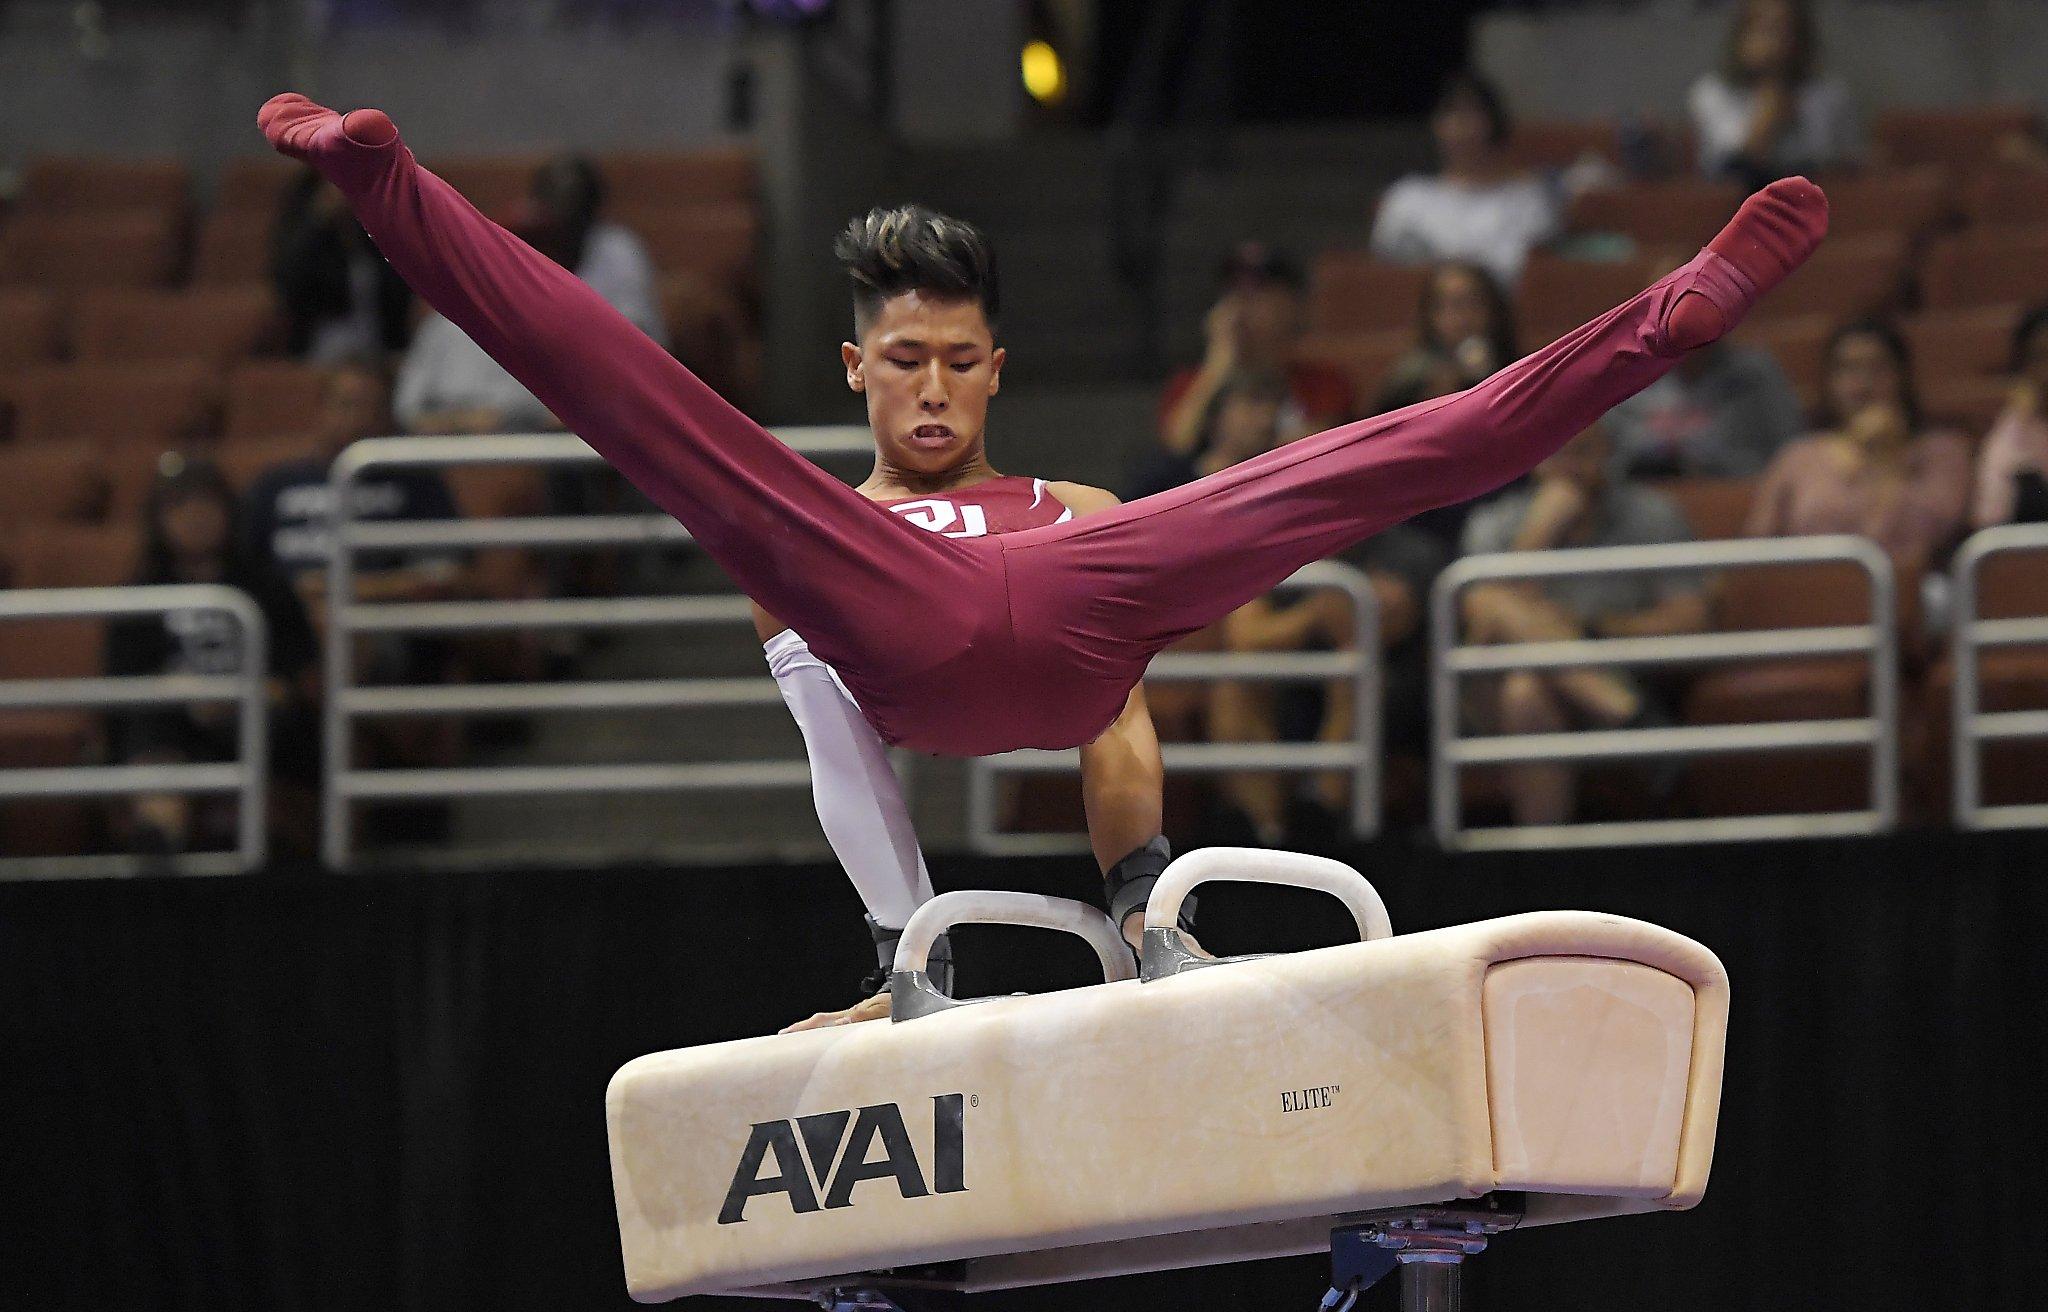 yul moldauer takes lead after 1st day of u s gymnastics